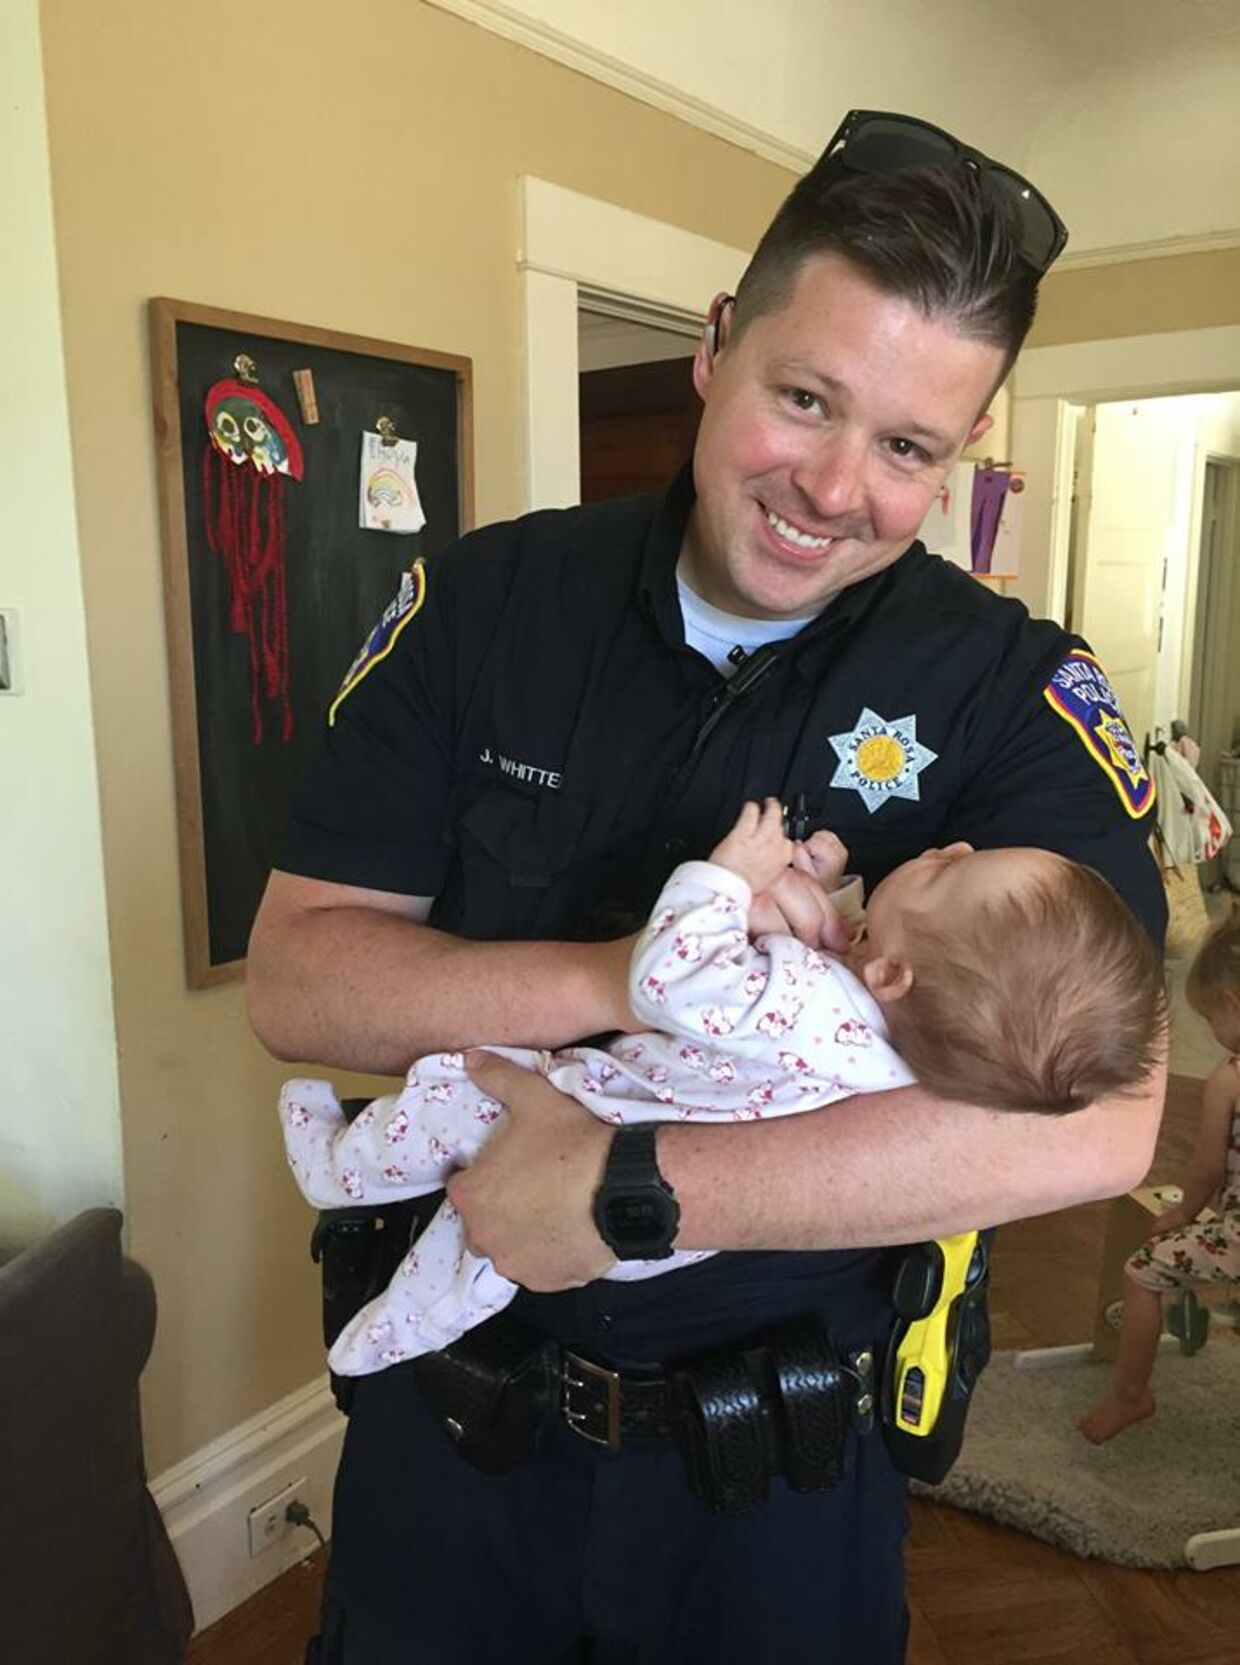 Politimanden Jason Whitten med sin adopterede datter.